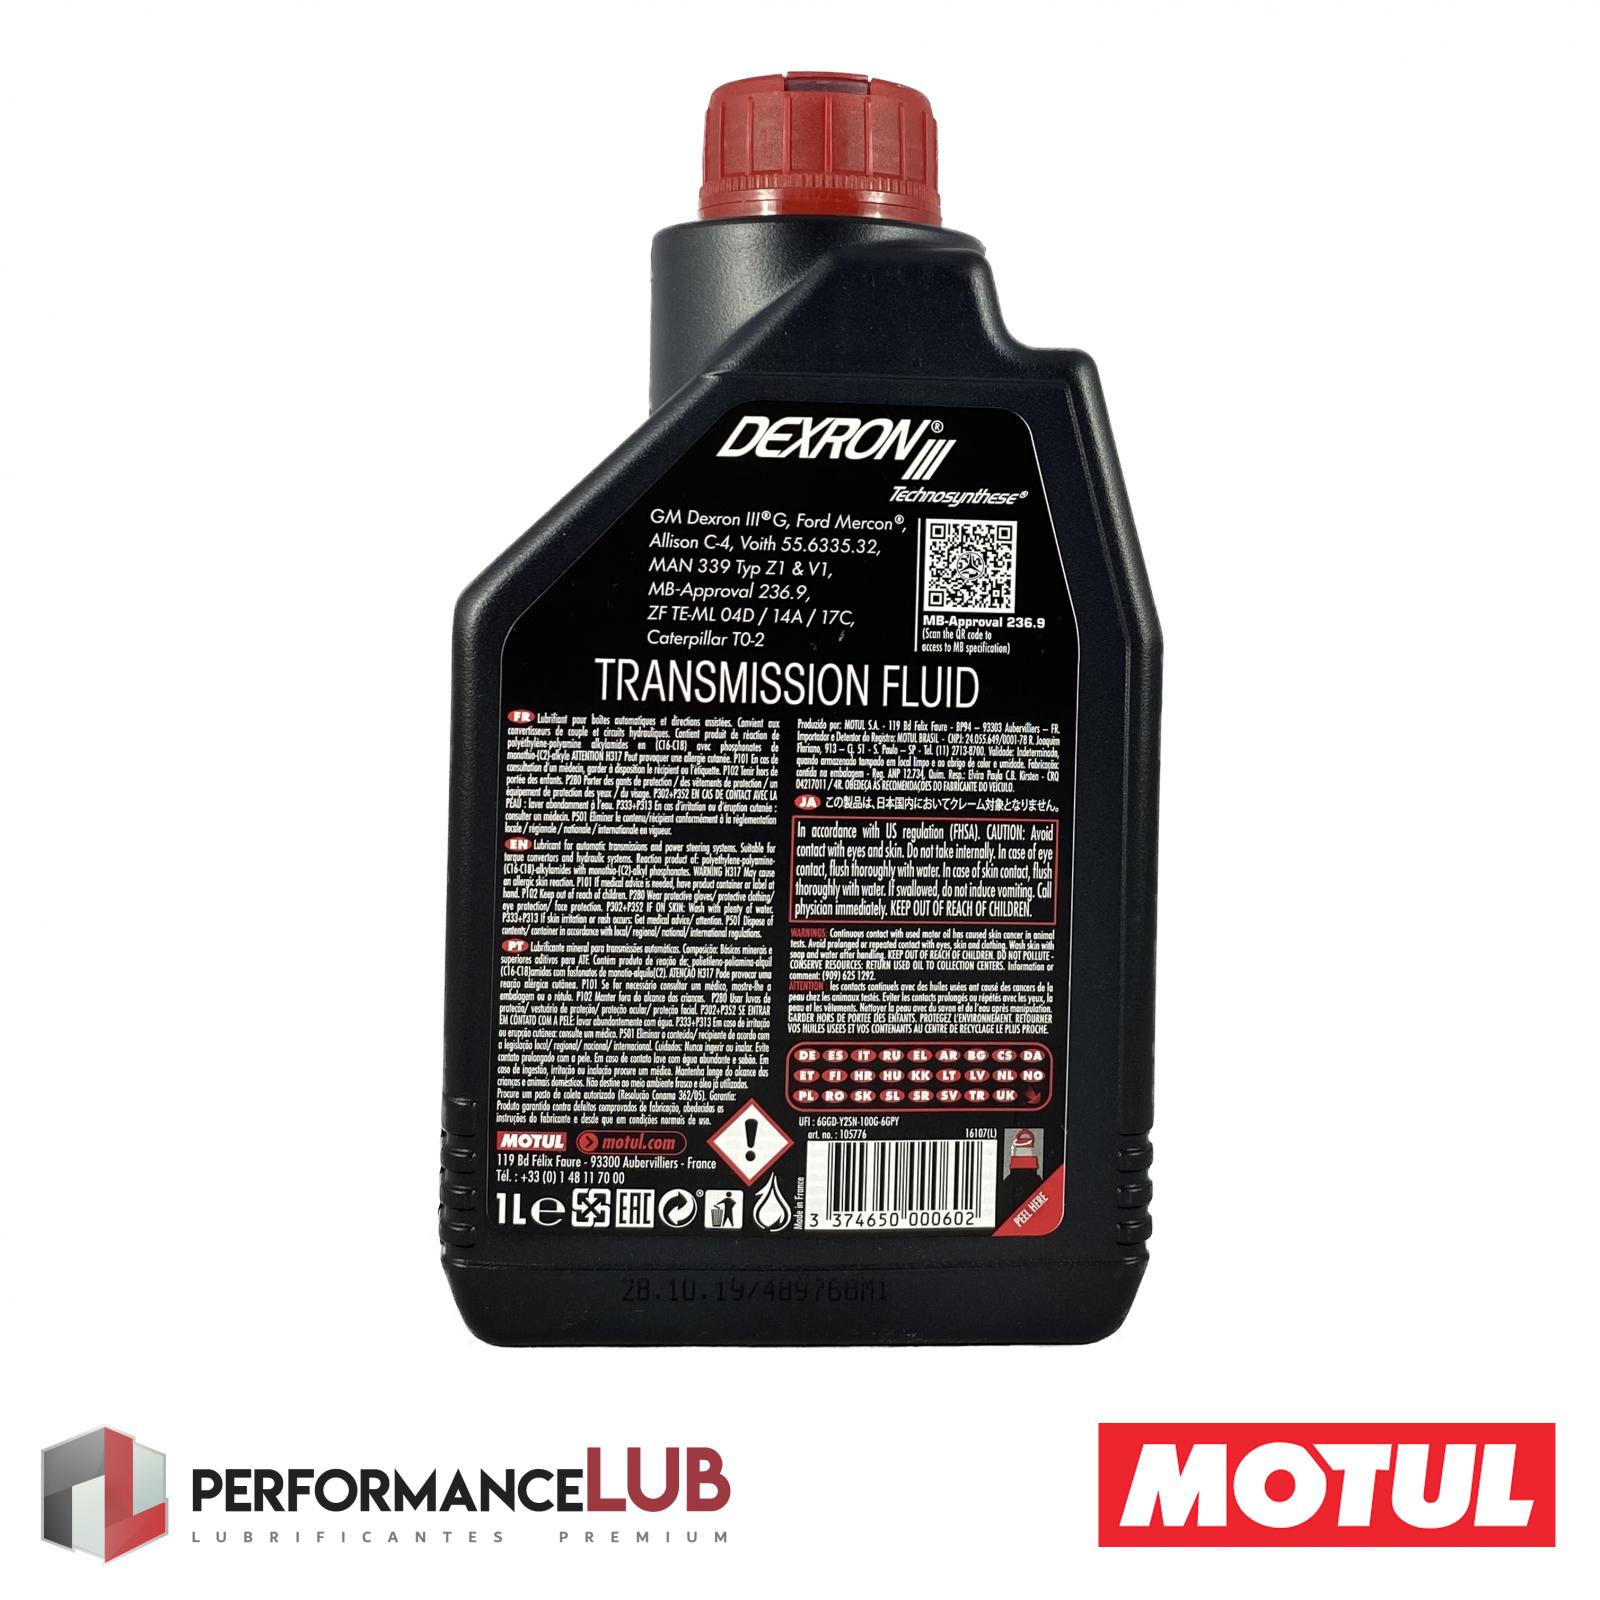 Dexron III - 1 litro - PerformanceLUB Lubrificantes Premium